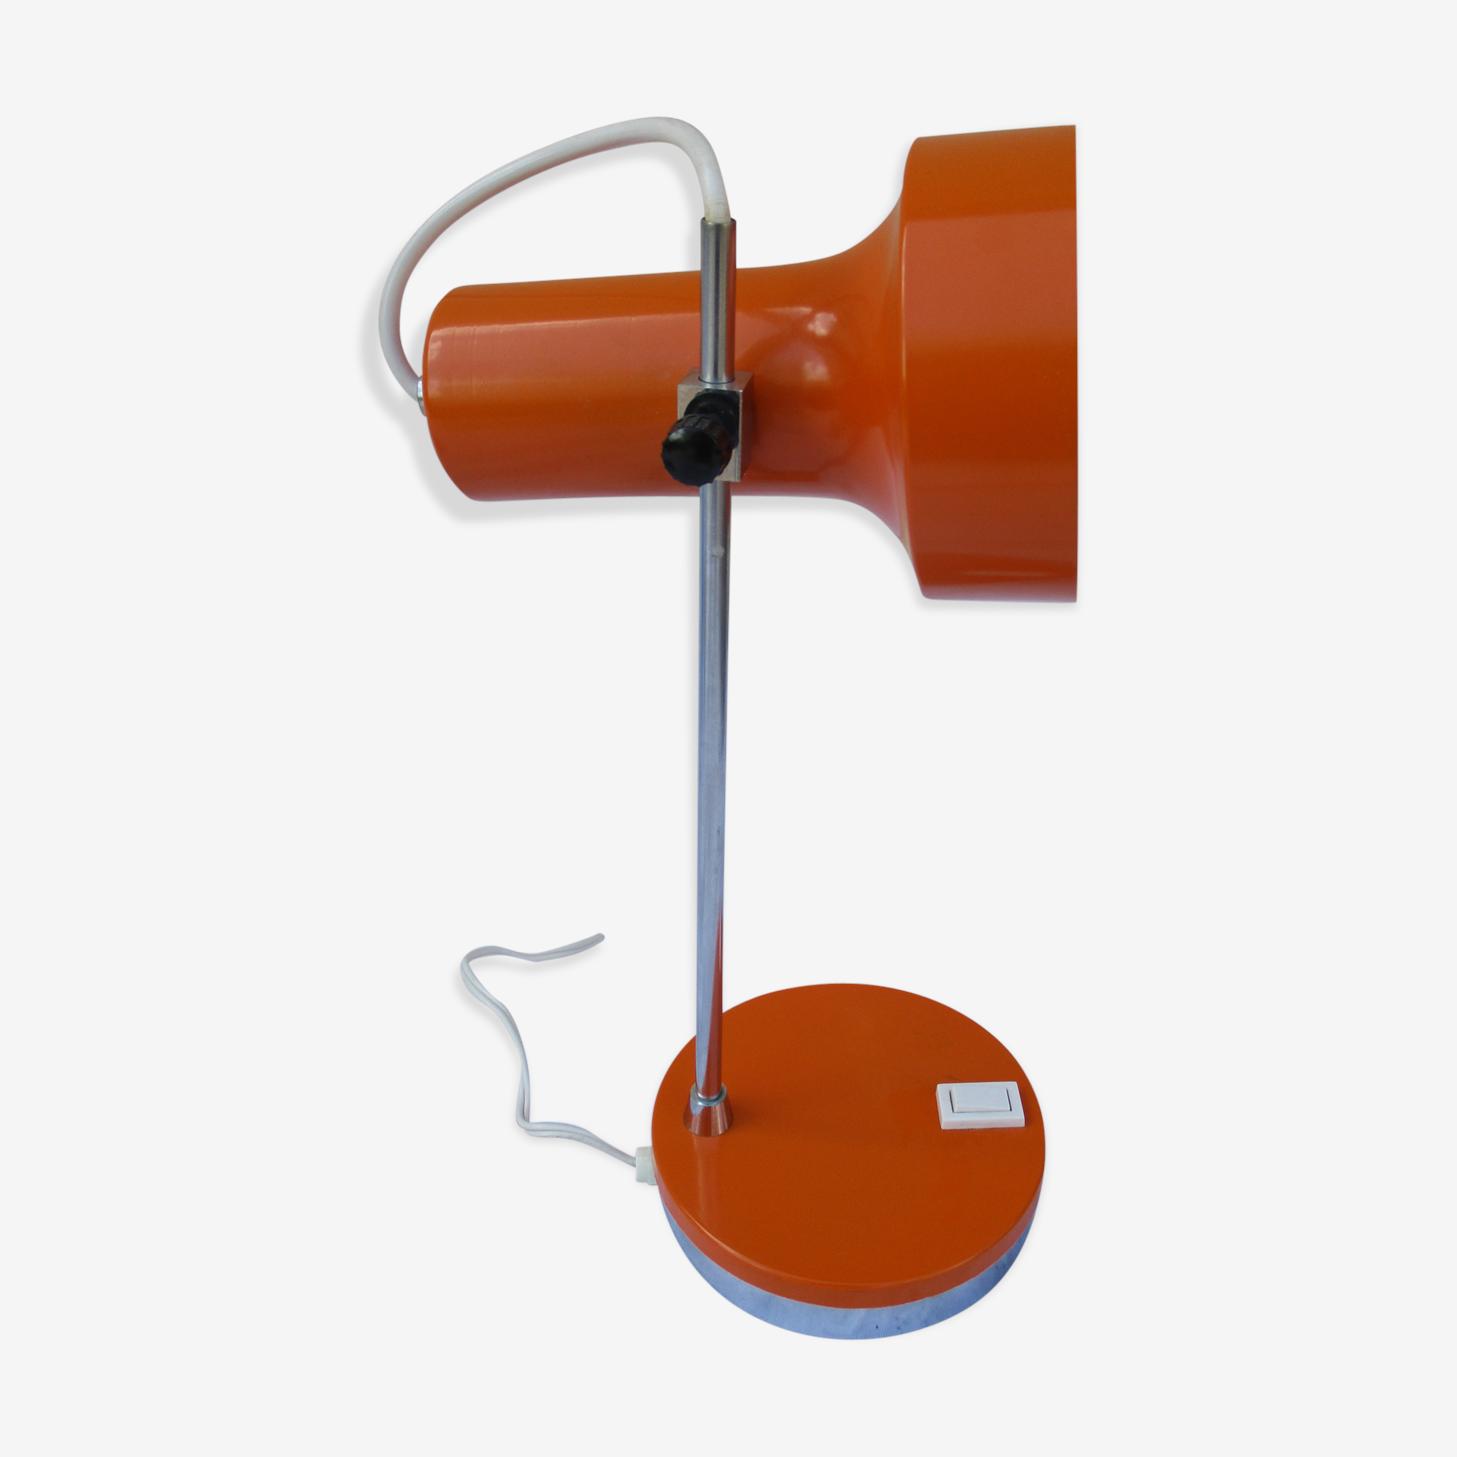 Office orange lamp vintage 70s